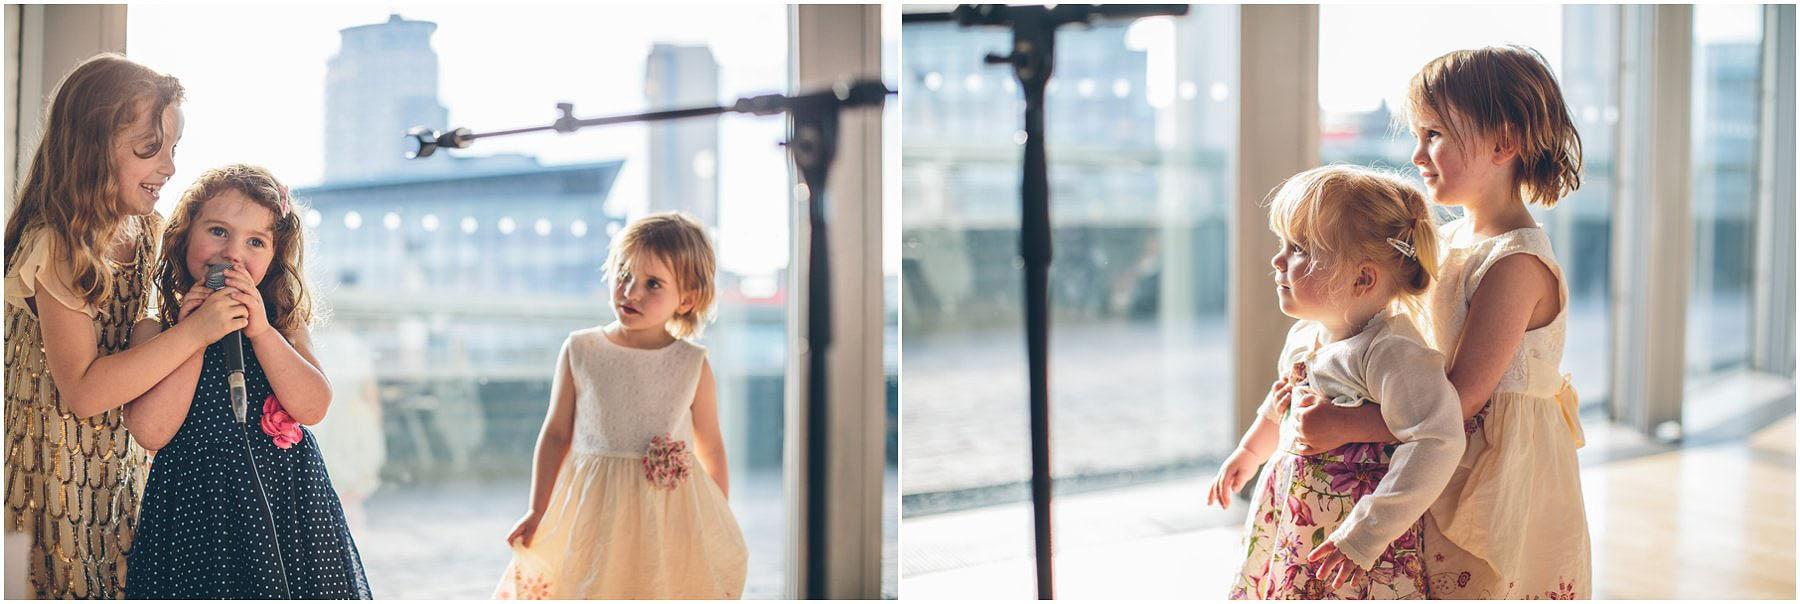 Lowry_Theatre_Wedding_Photography_0123